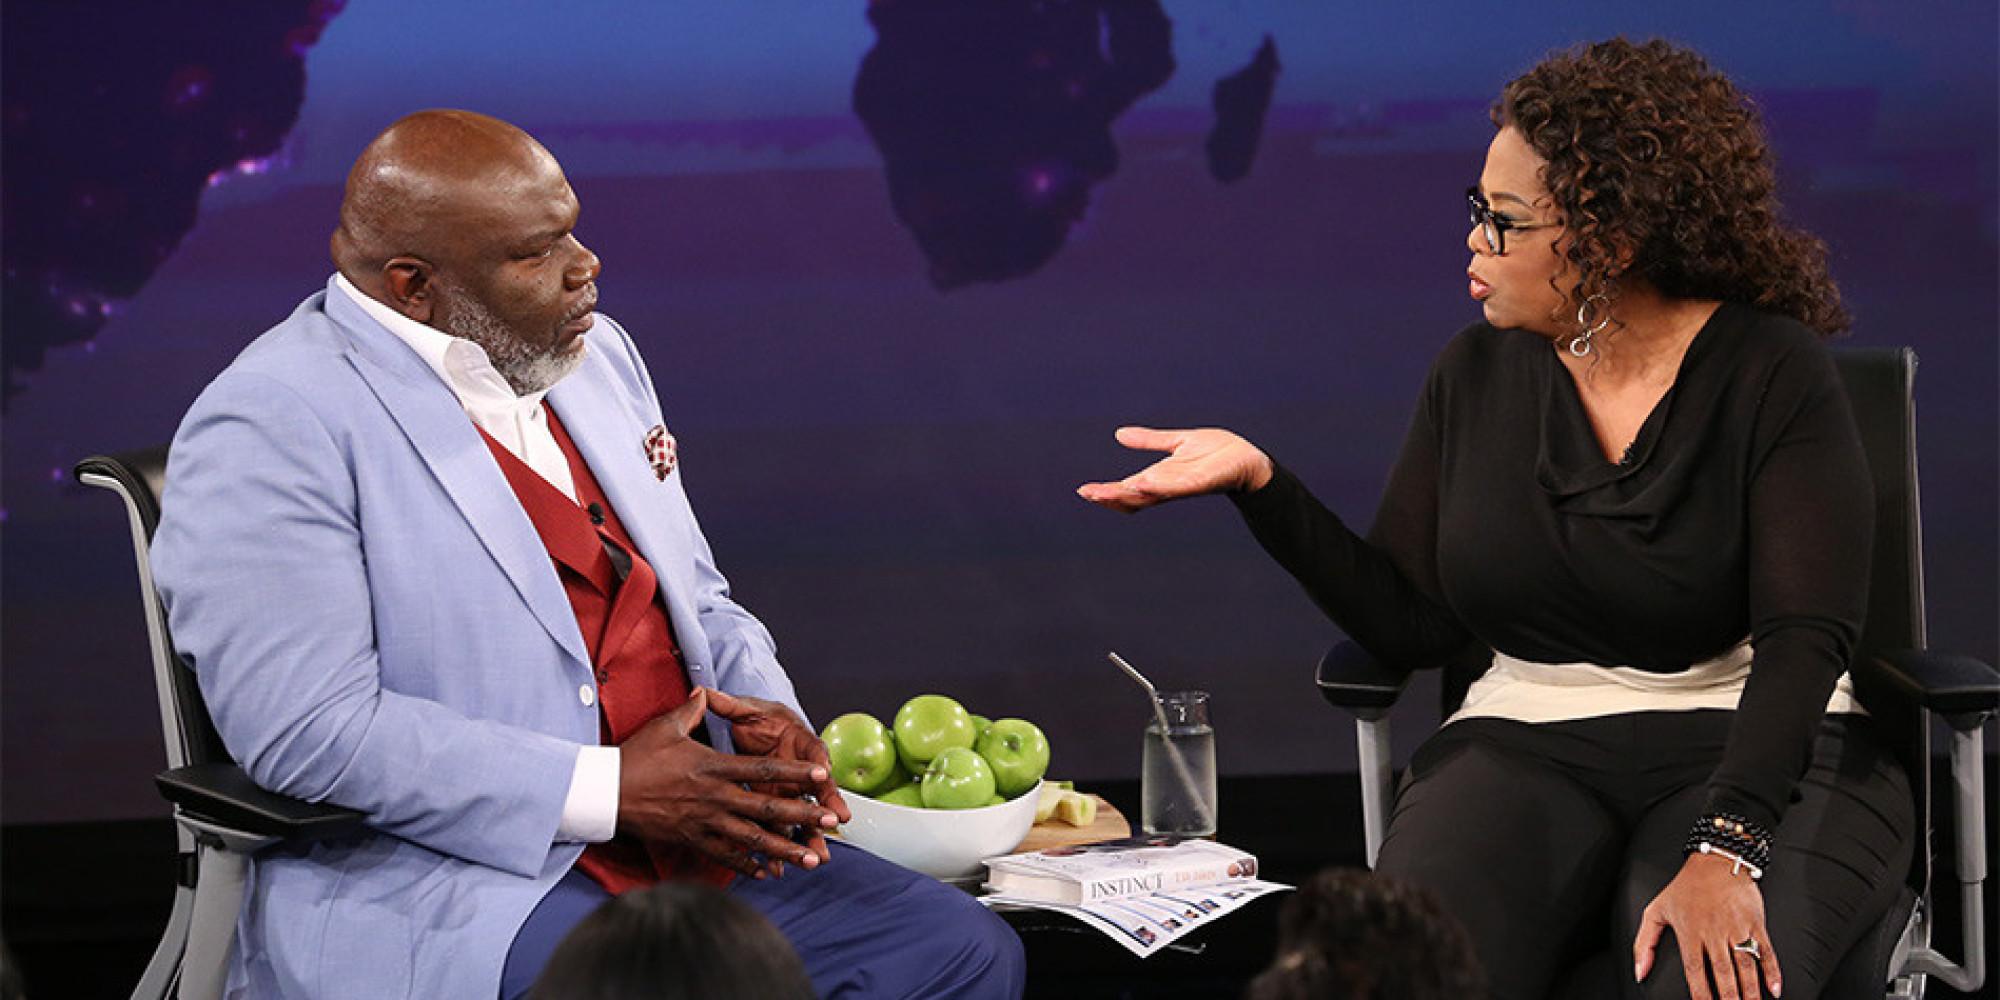 oprah life class relationship